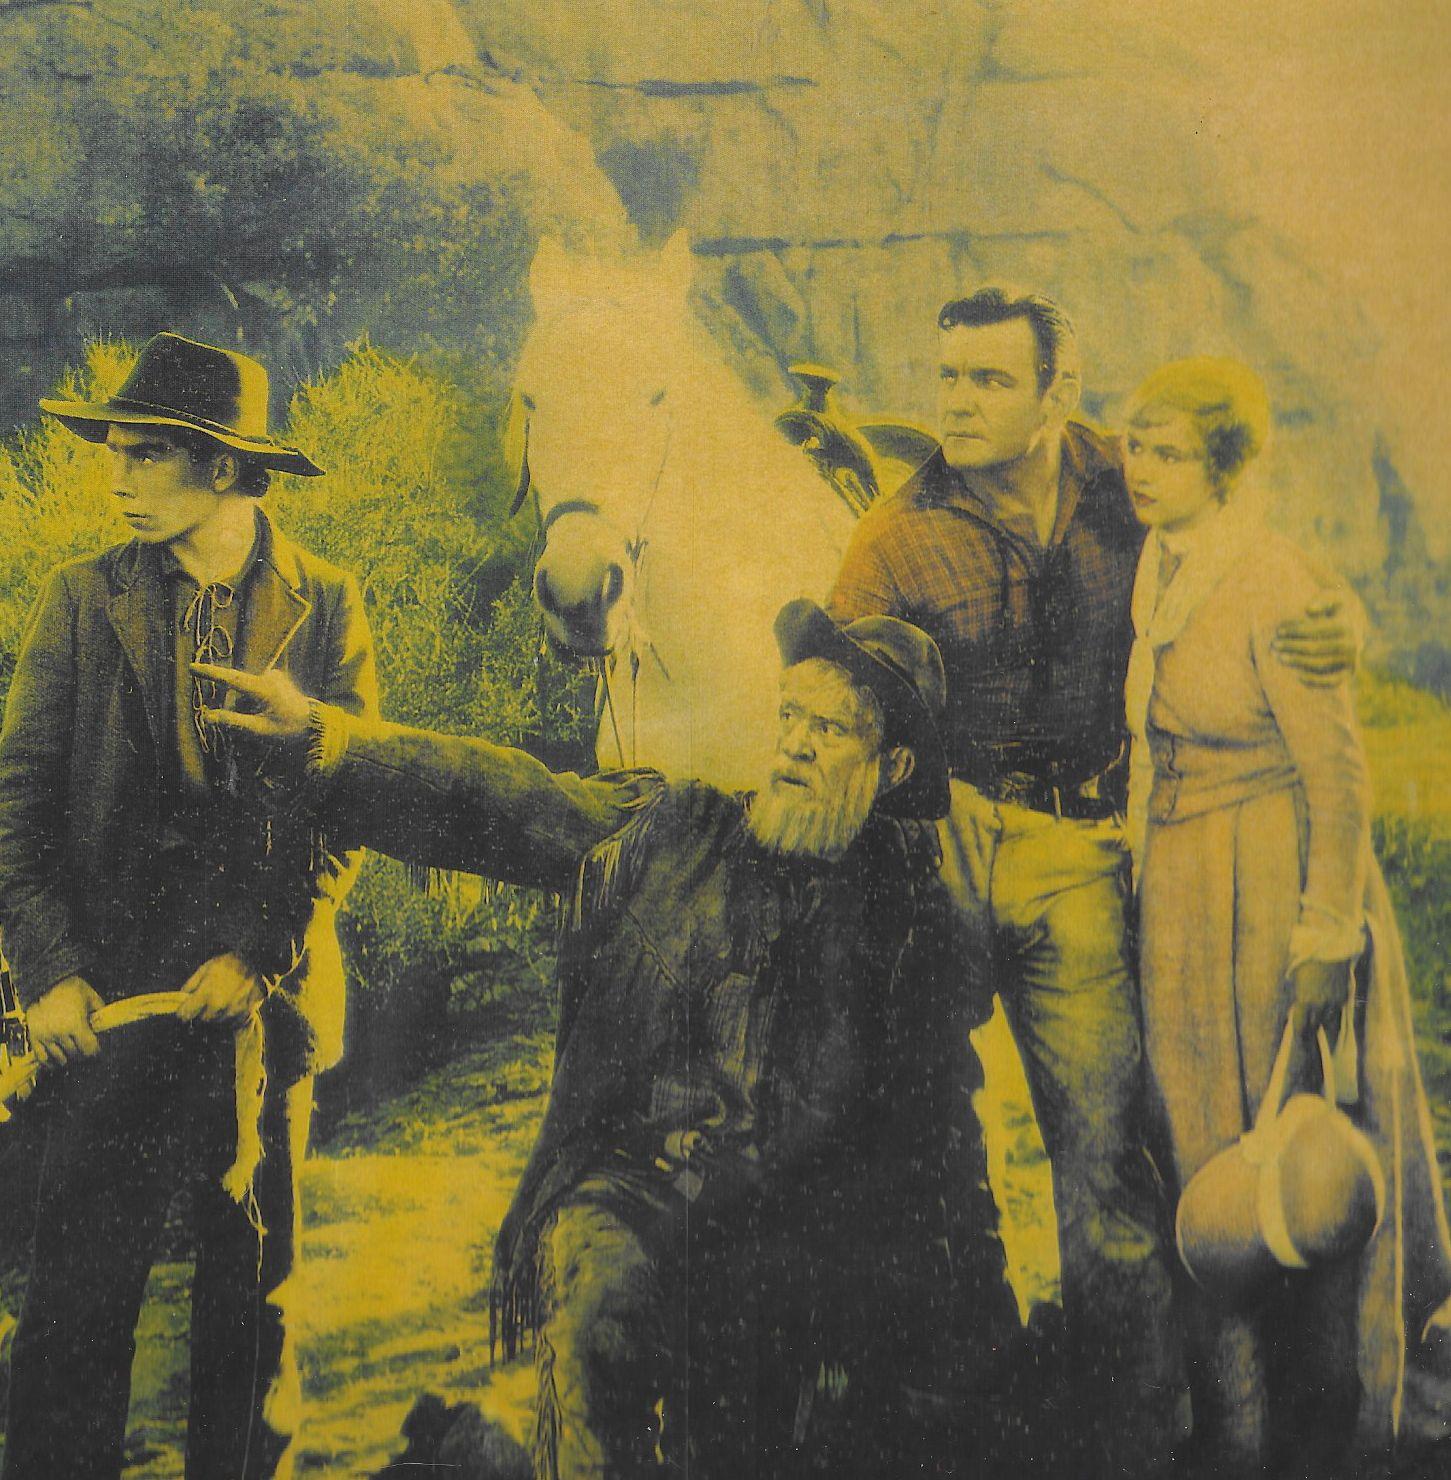 Buck Black, Buck Jones, and Cecilia Parker in Unknown Valley (1933)